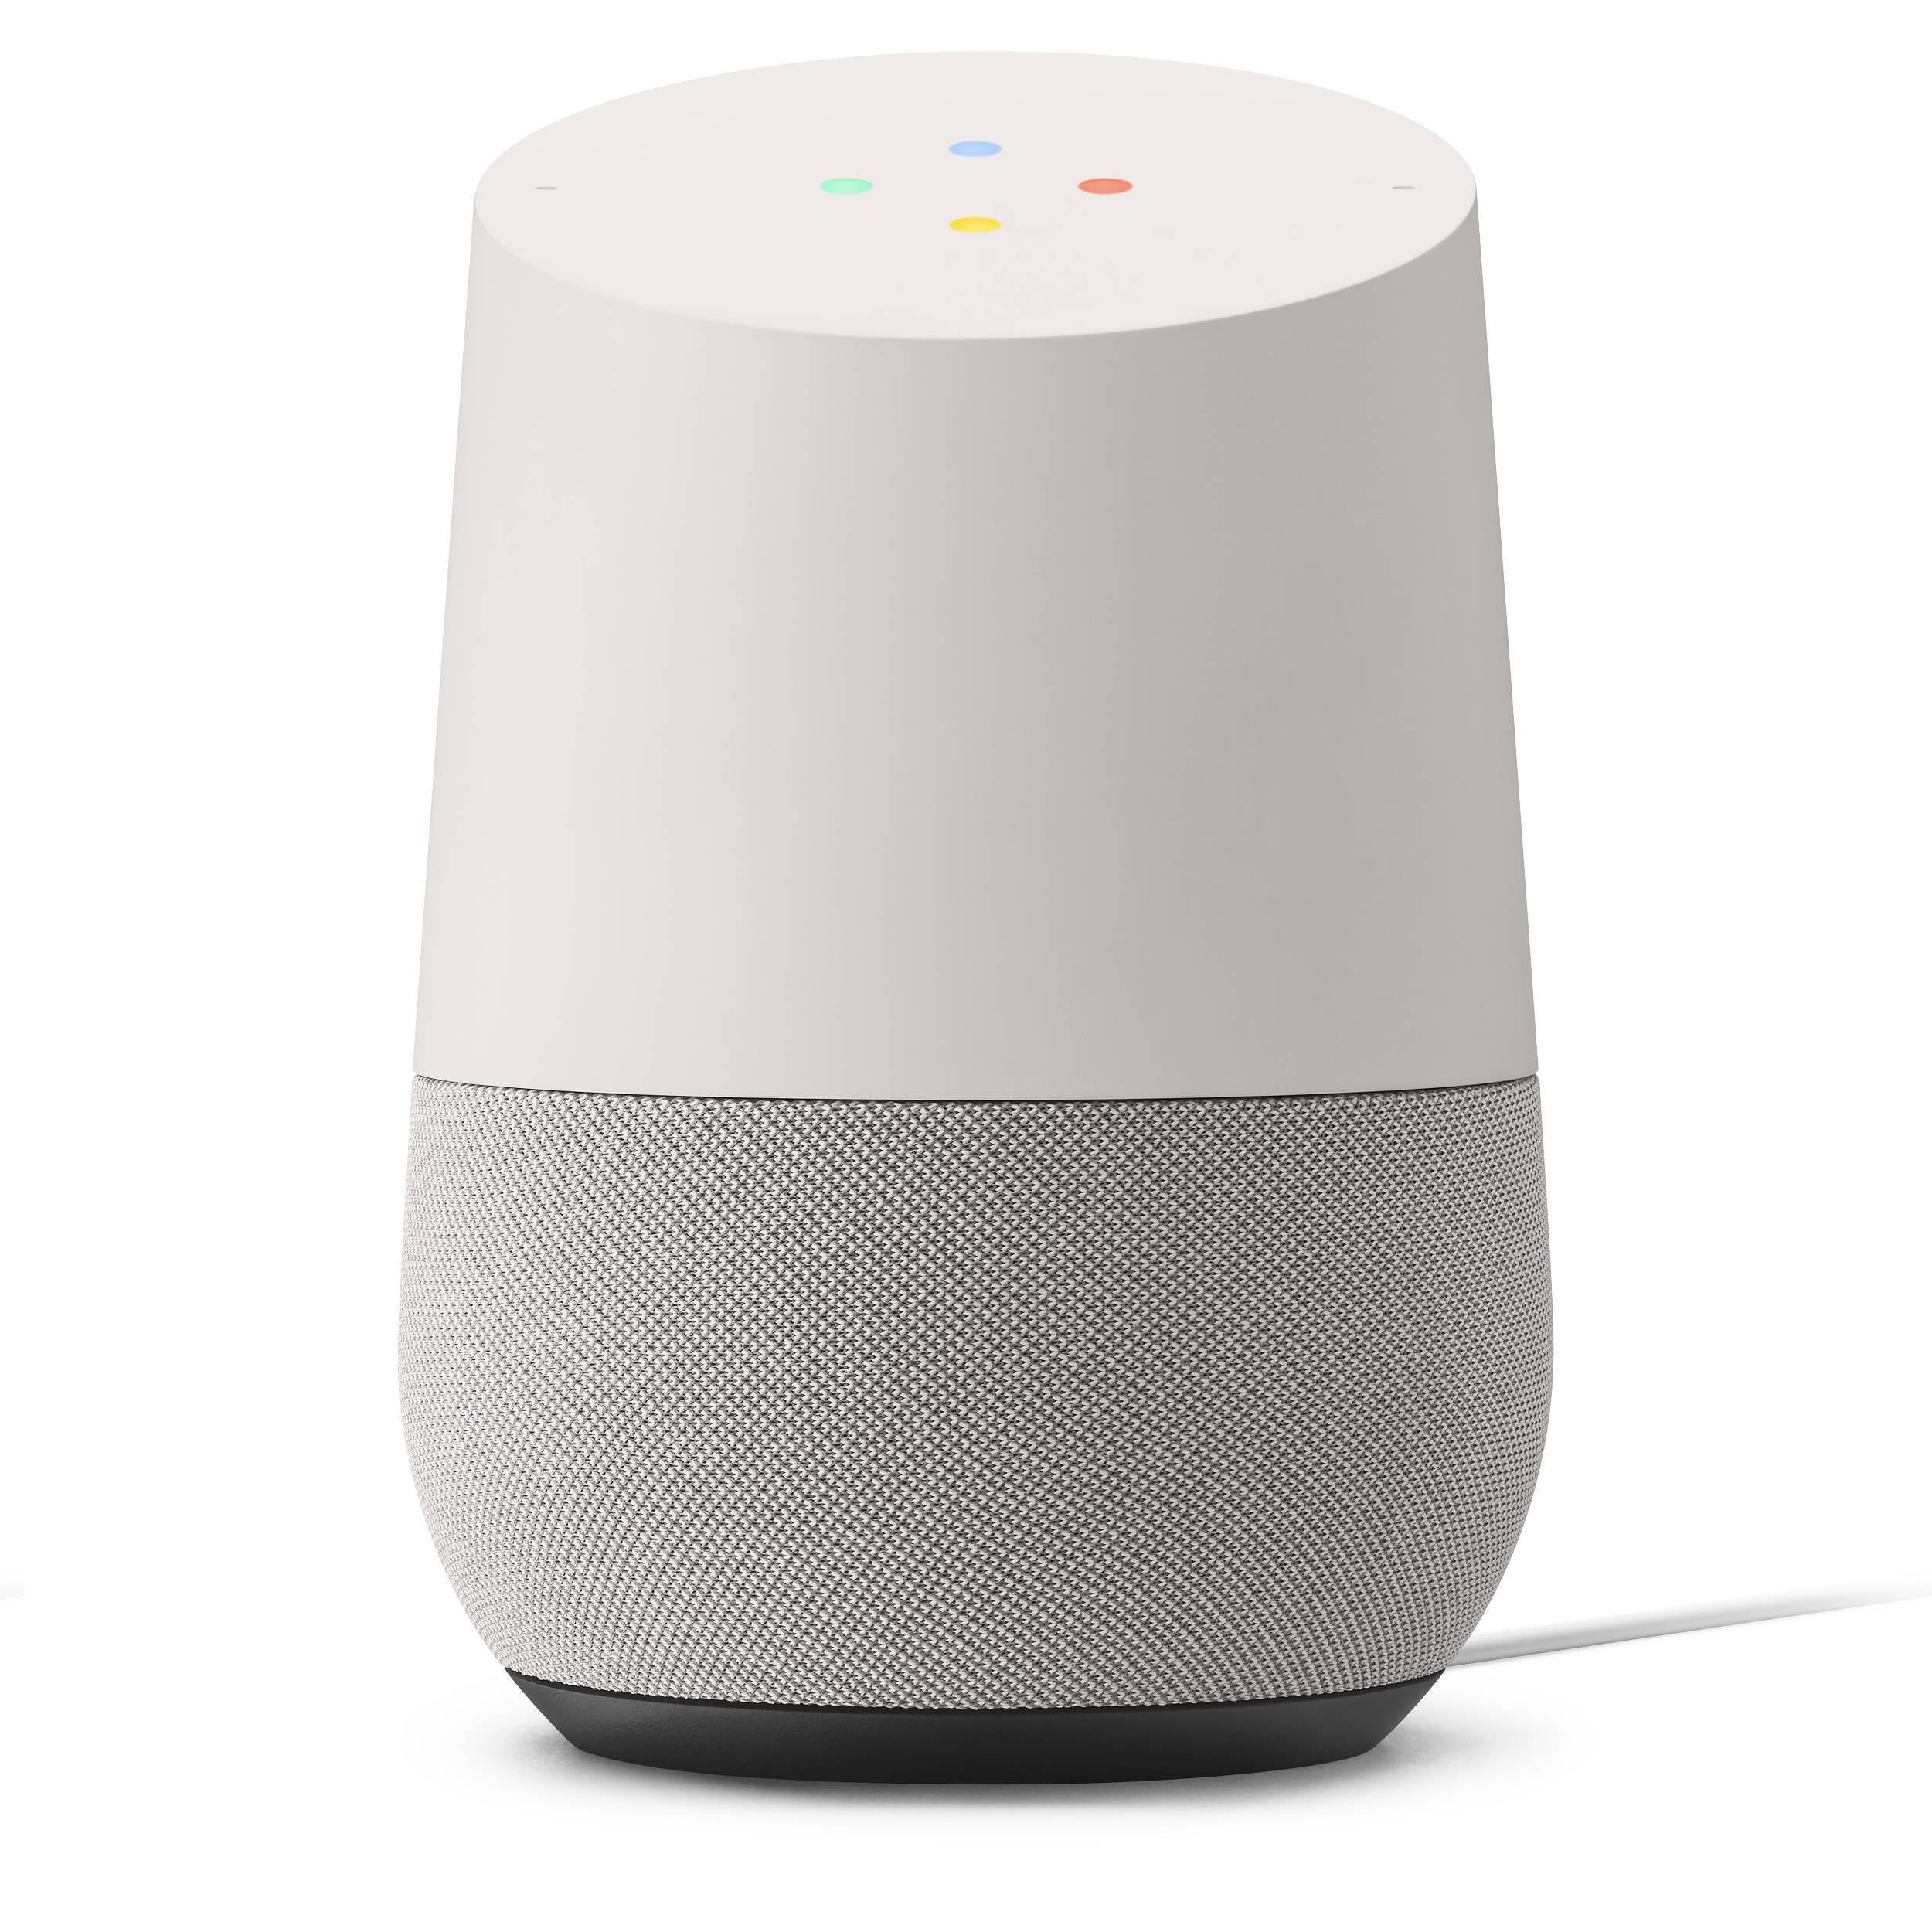 Costco Members: Google Home 2-pack $139.99